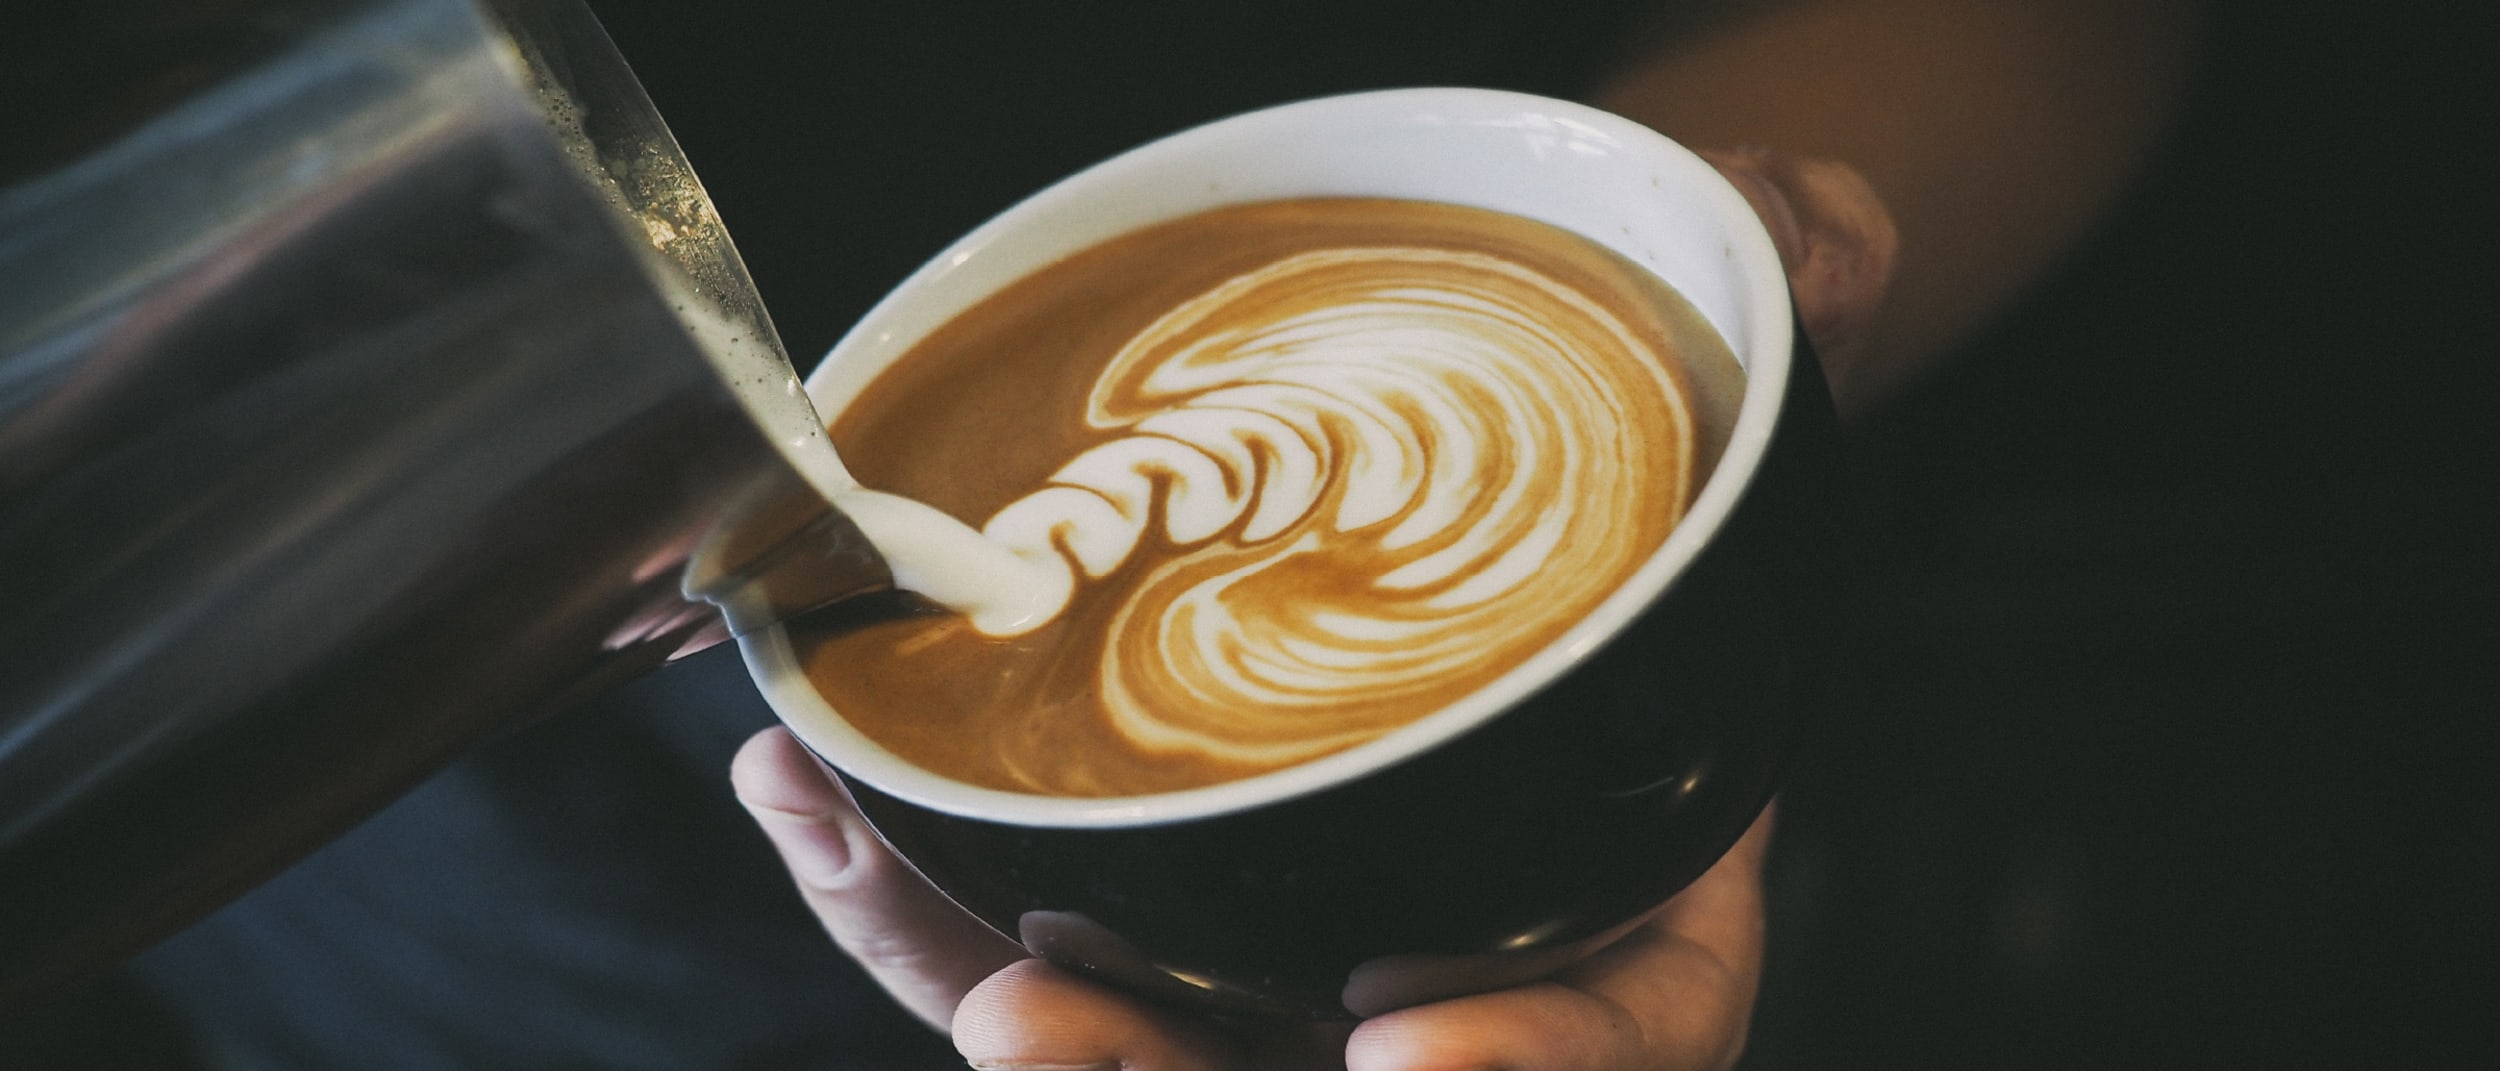 Your $2.90 coffee fix at YogaBar Café